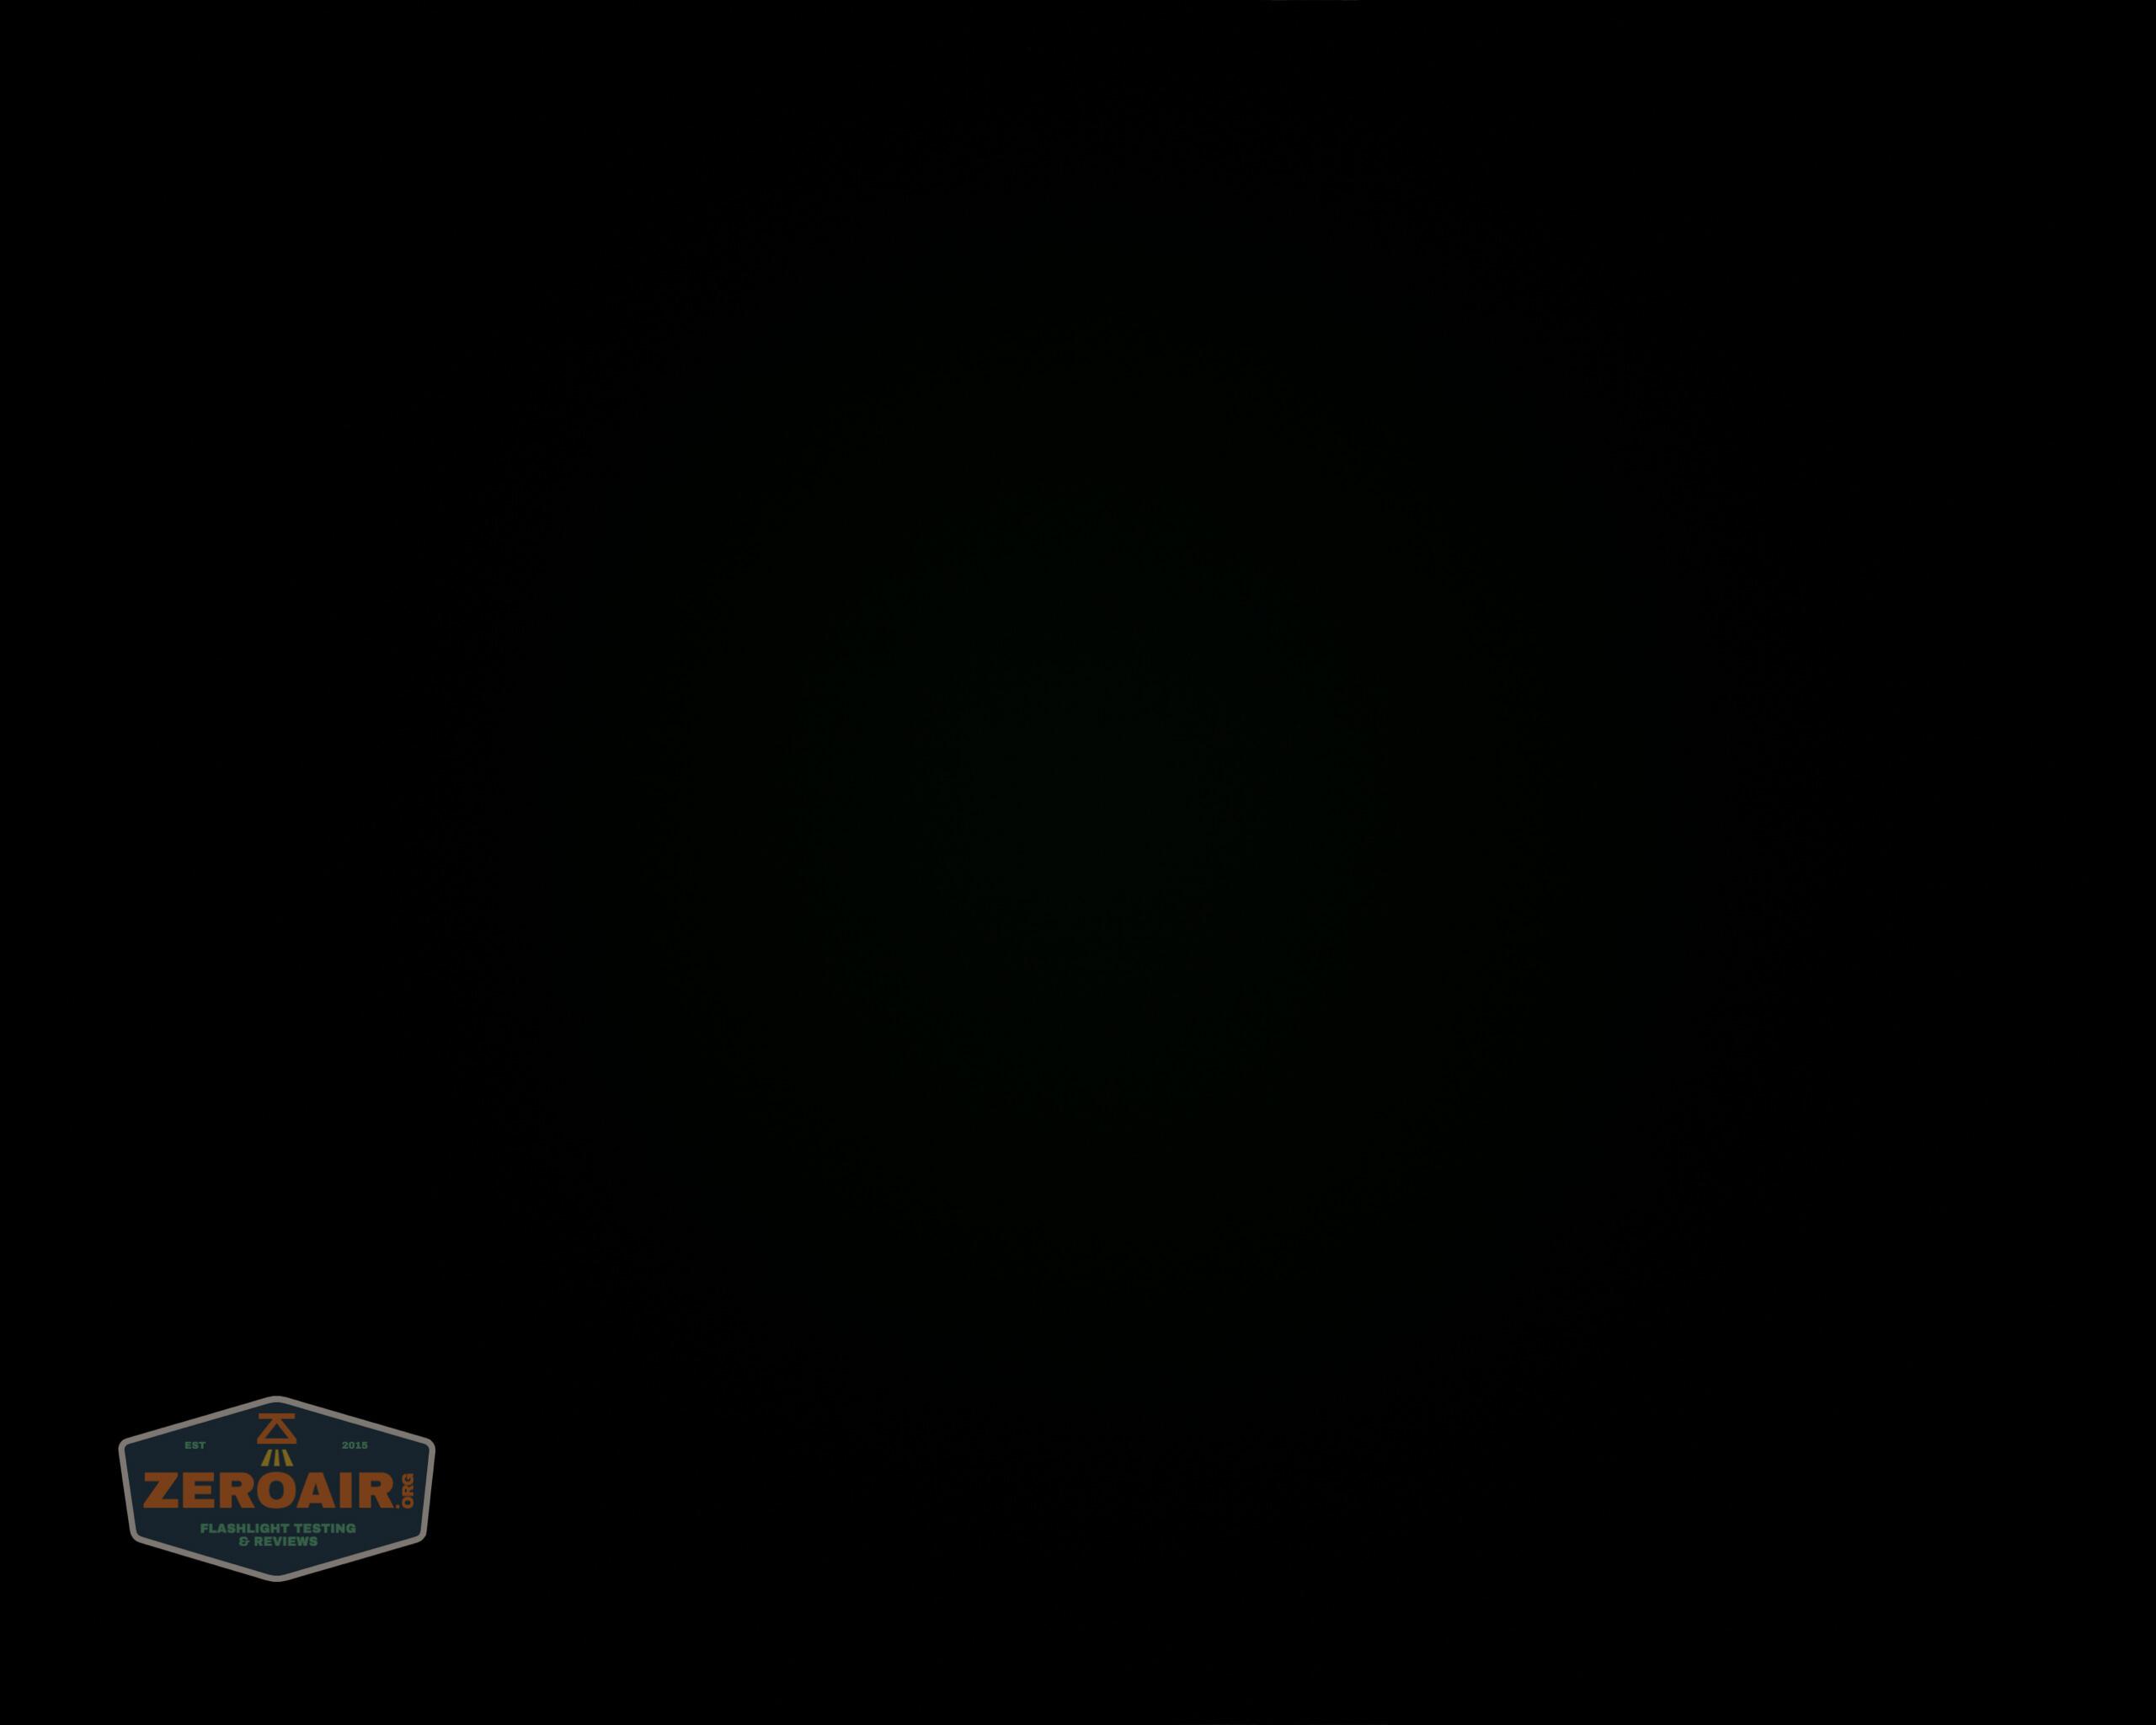 olight perun 2 21700 headlamp orange beamshot ceiling 1